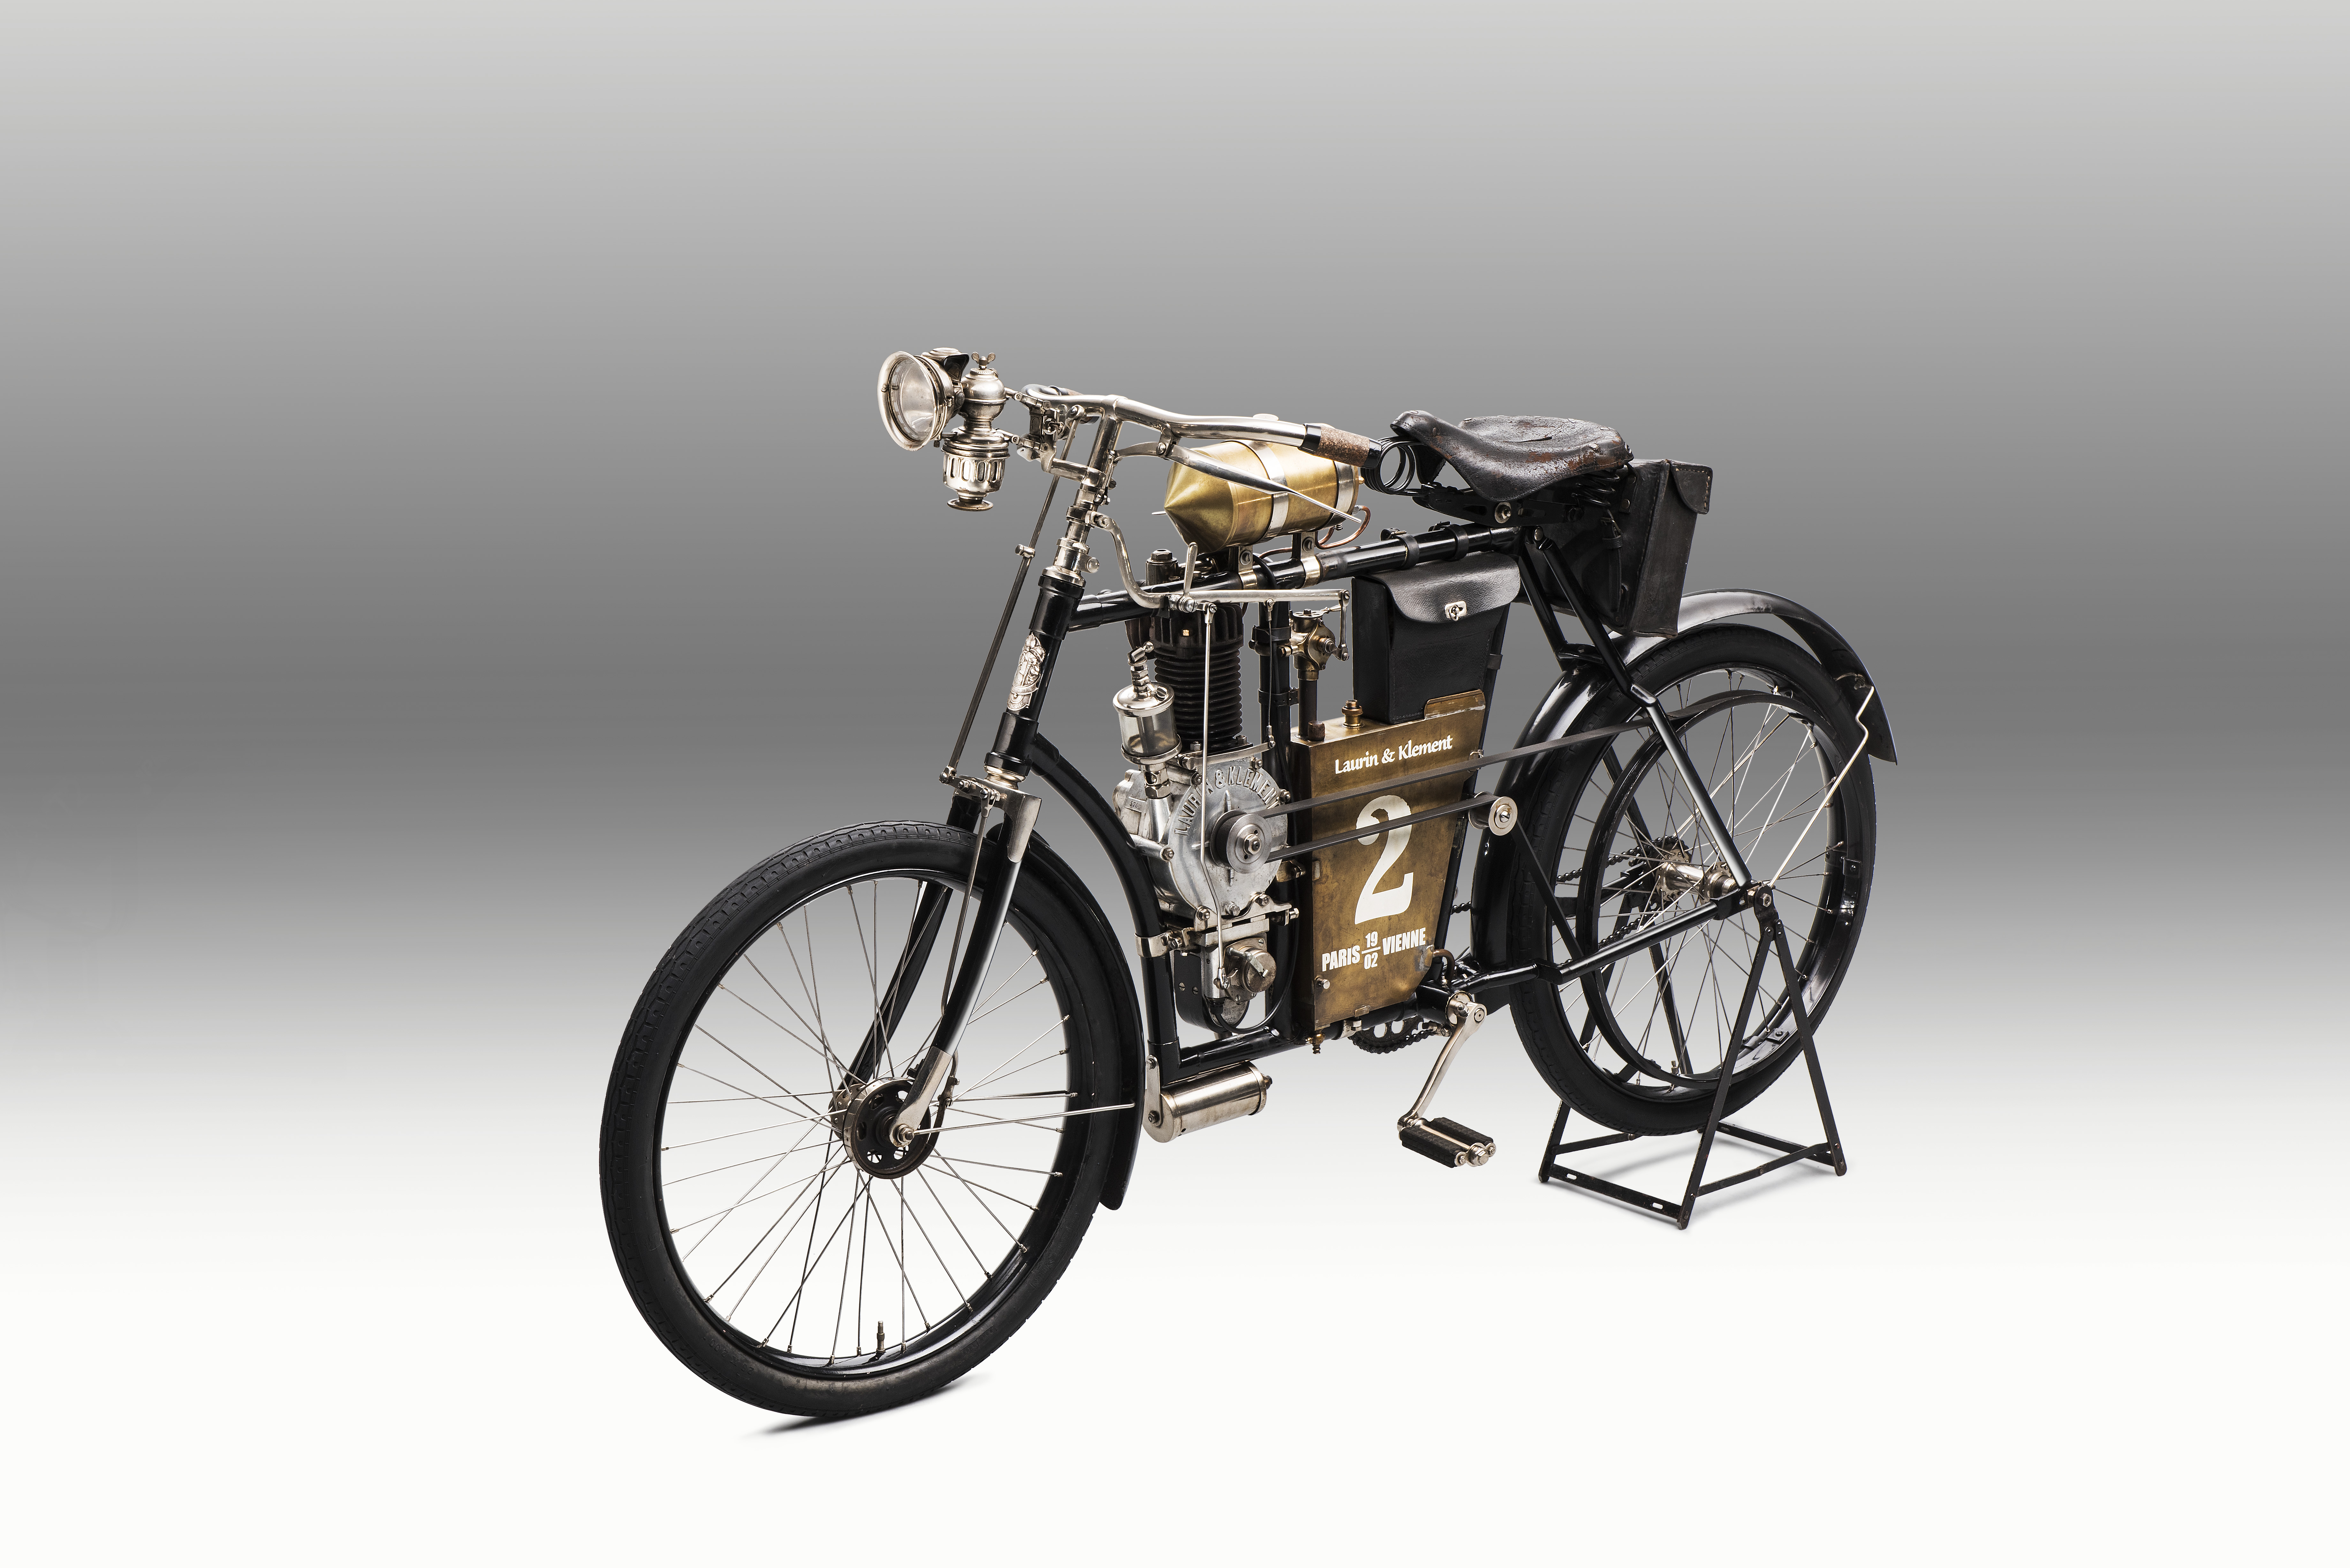 Laurin & Klement SLAVIA B: The history of SKODA Motorsport began 120 years ago between Paris and Berlin - Image 6